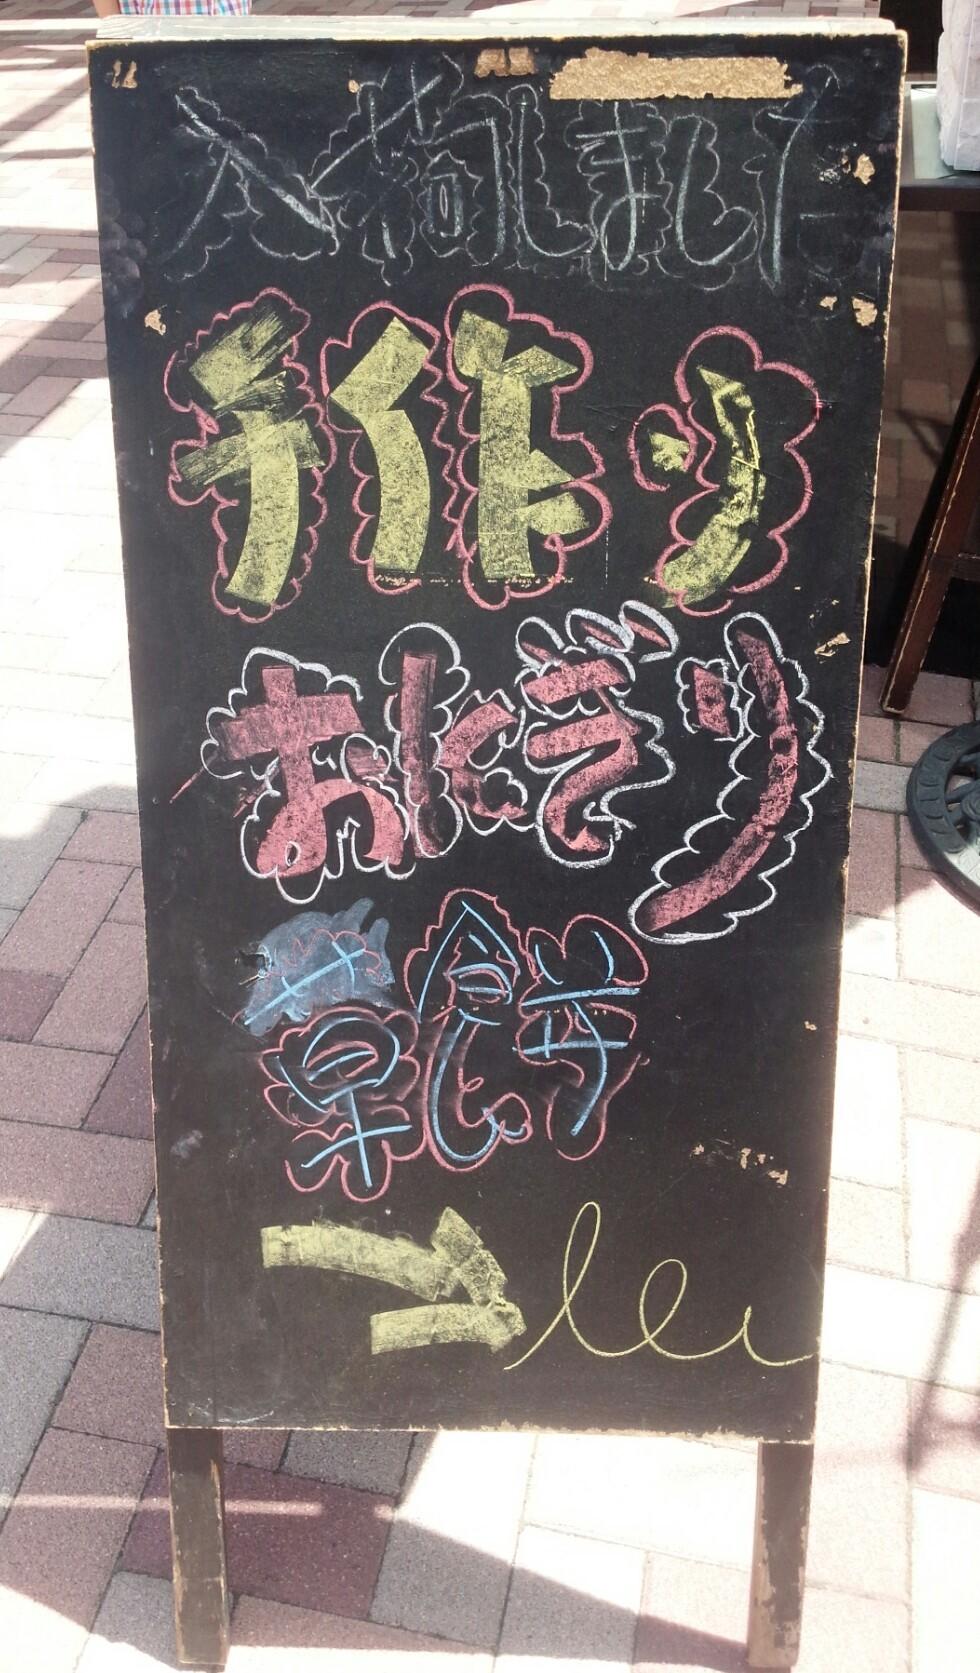 野菜市場 東北自動車道那須高原SA(上り線)店 name=